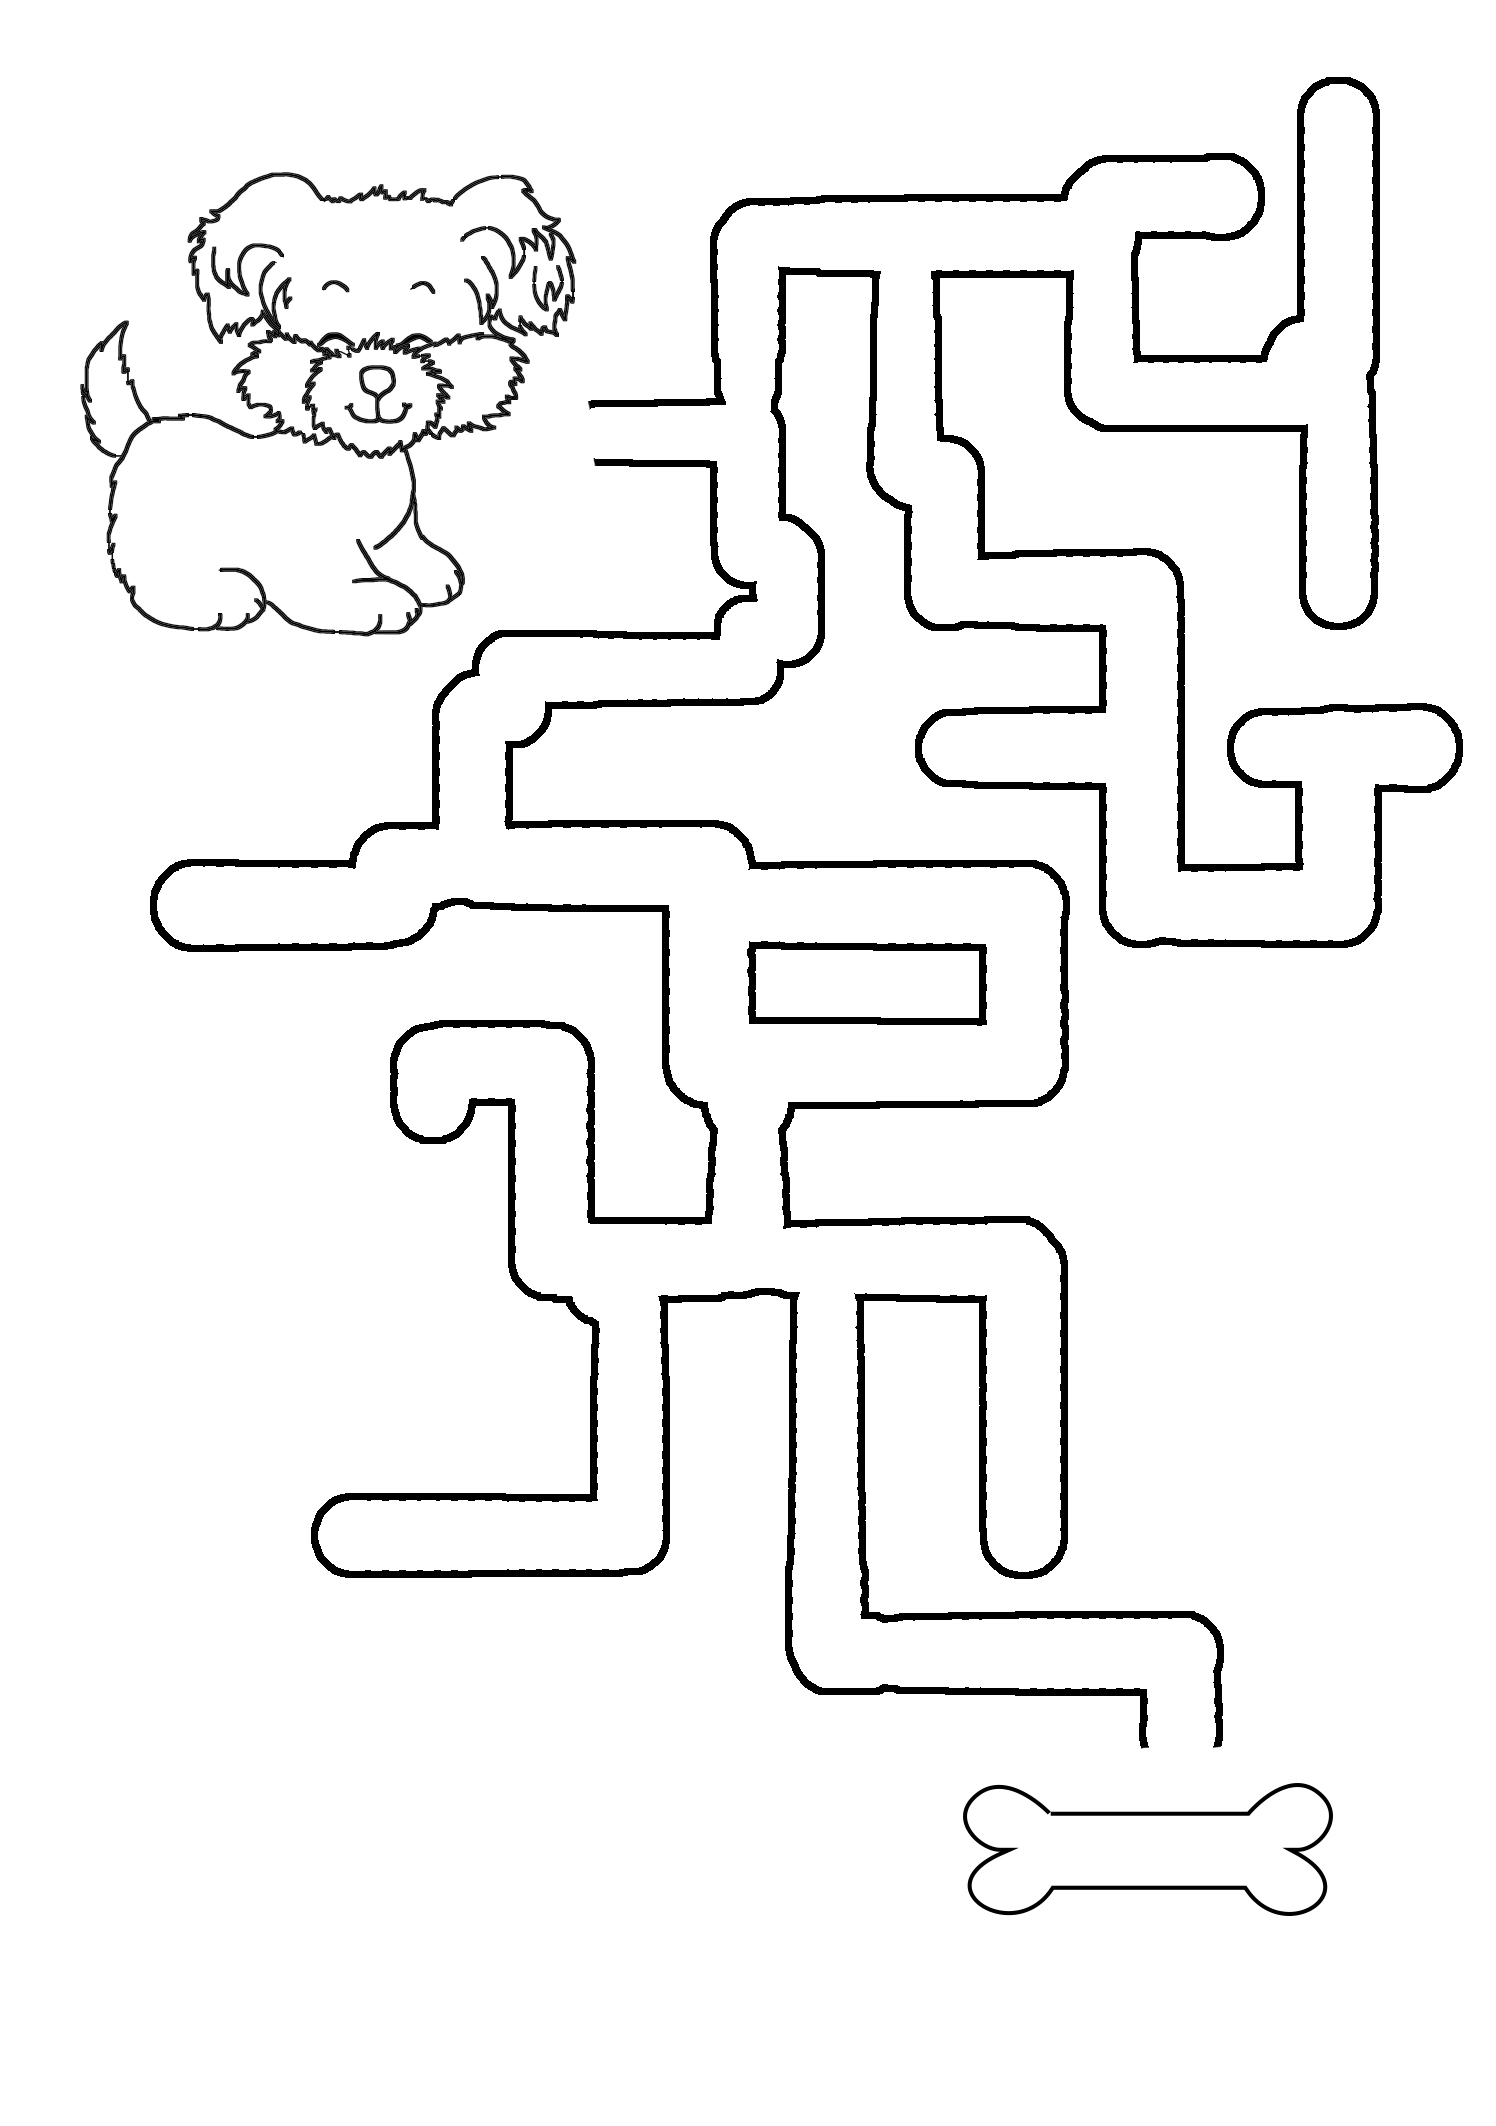 maze to bring dog to bone